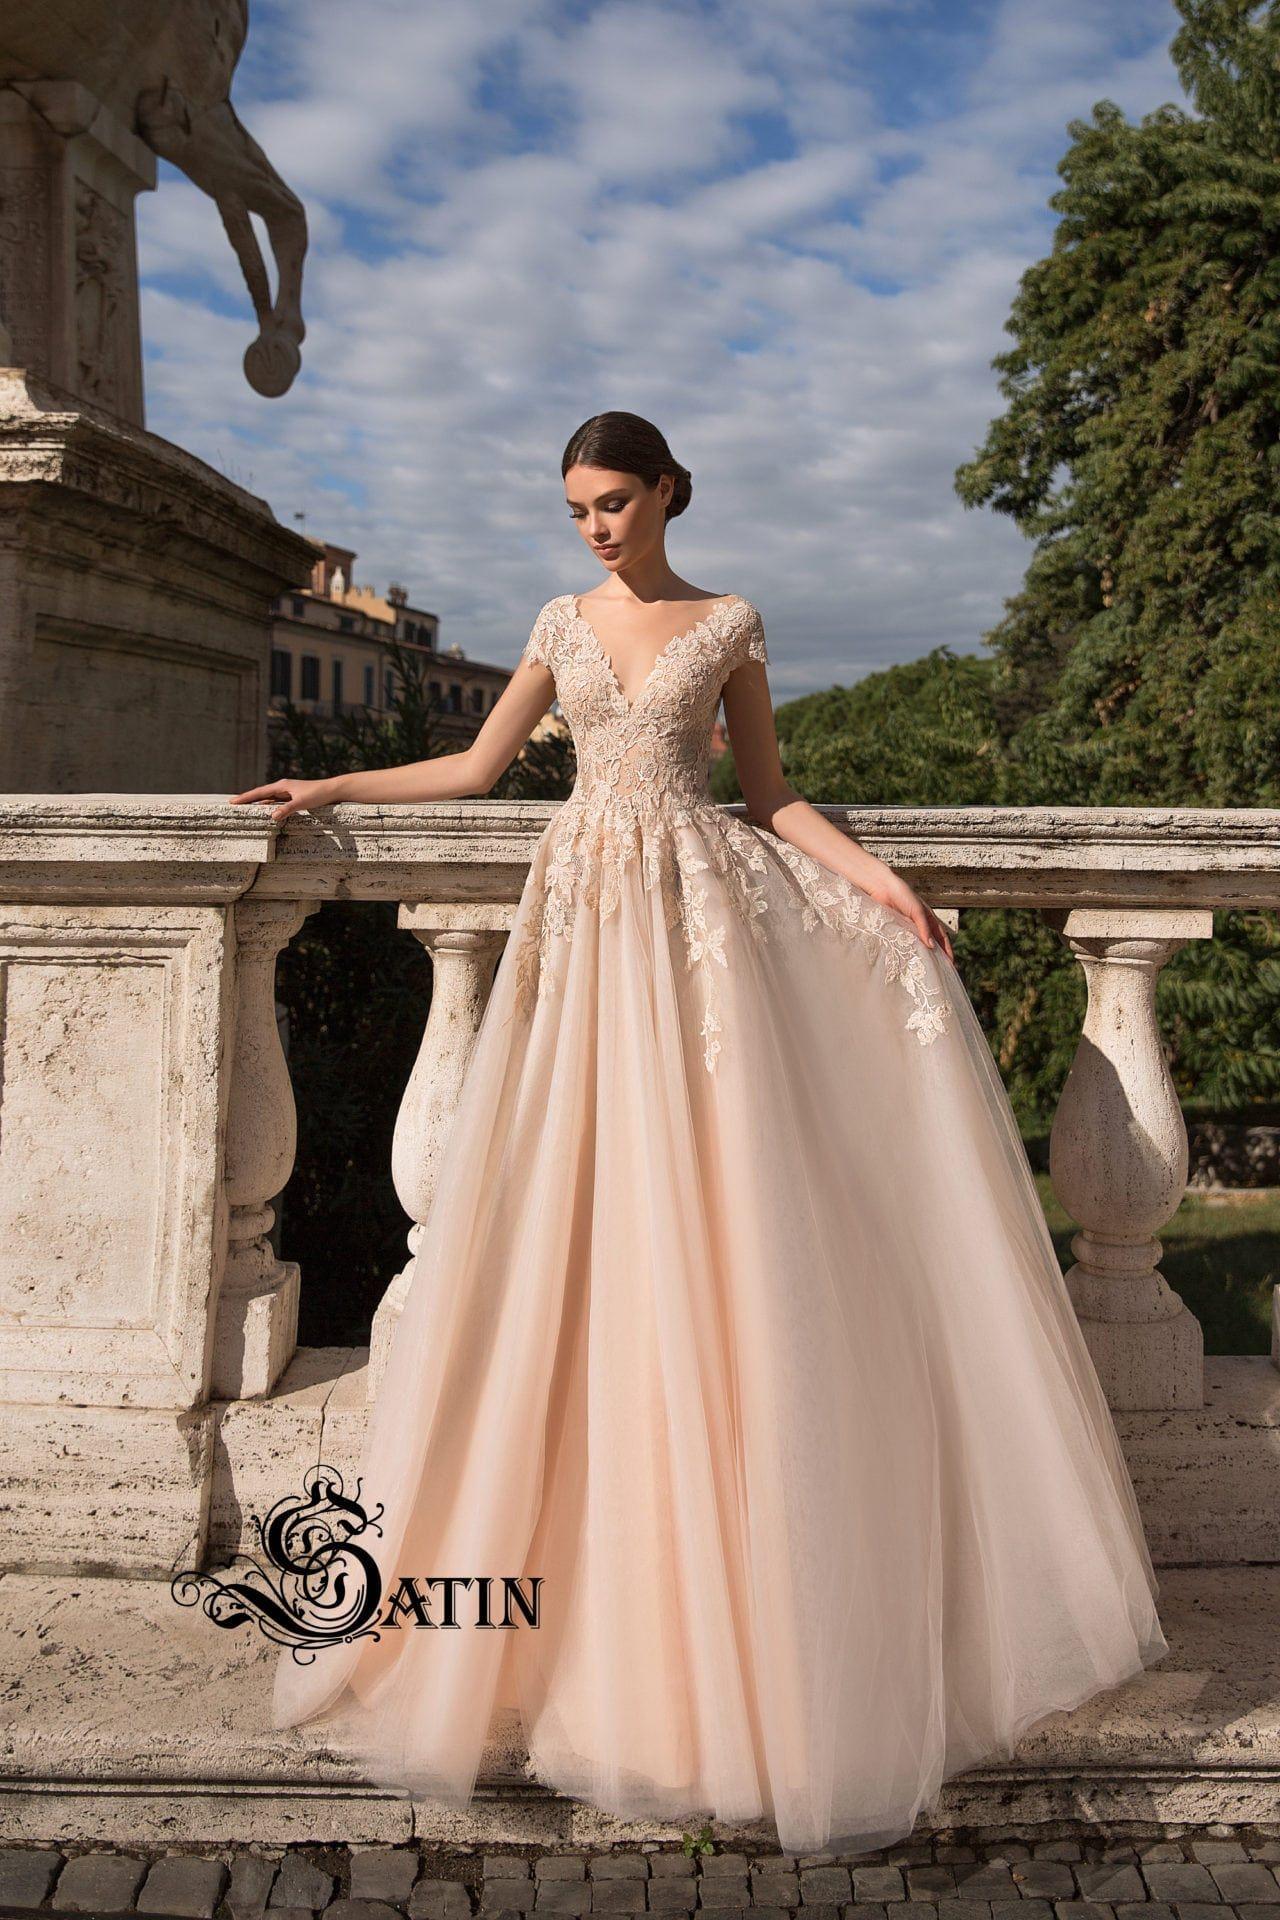 Most expensive wedding dress in the world  Satin Brautkollektion   Solomia  F  Gowns  Pinterest  Satin